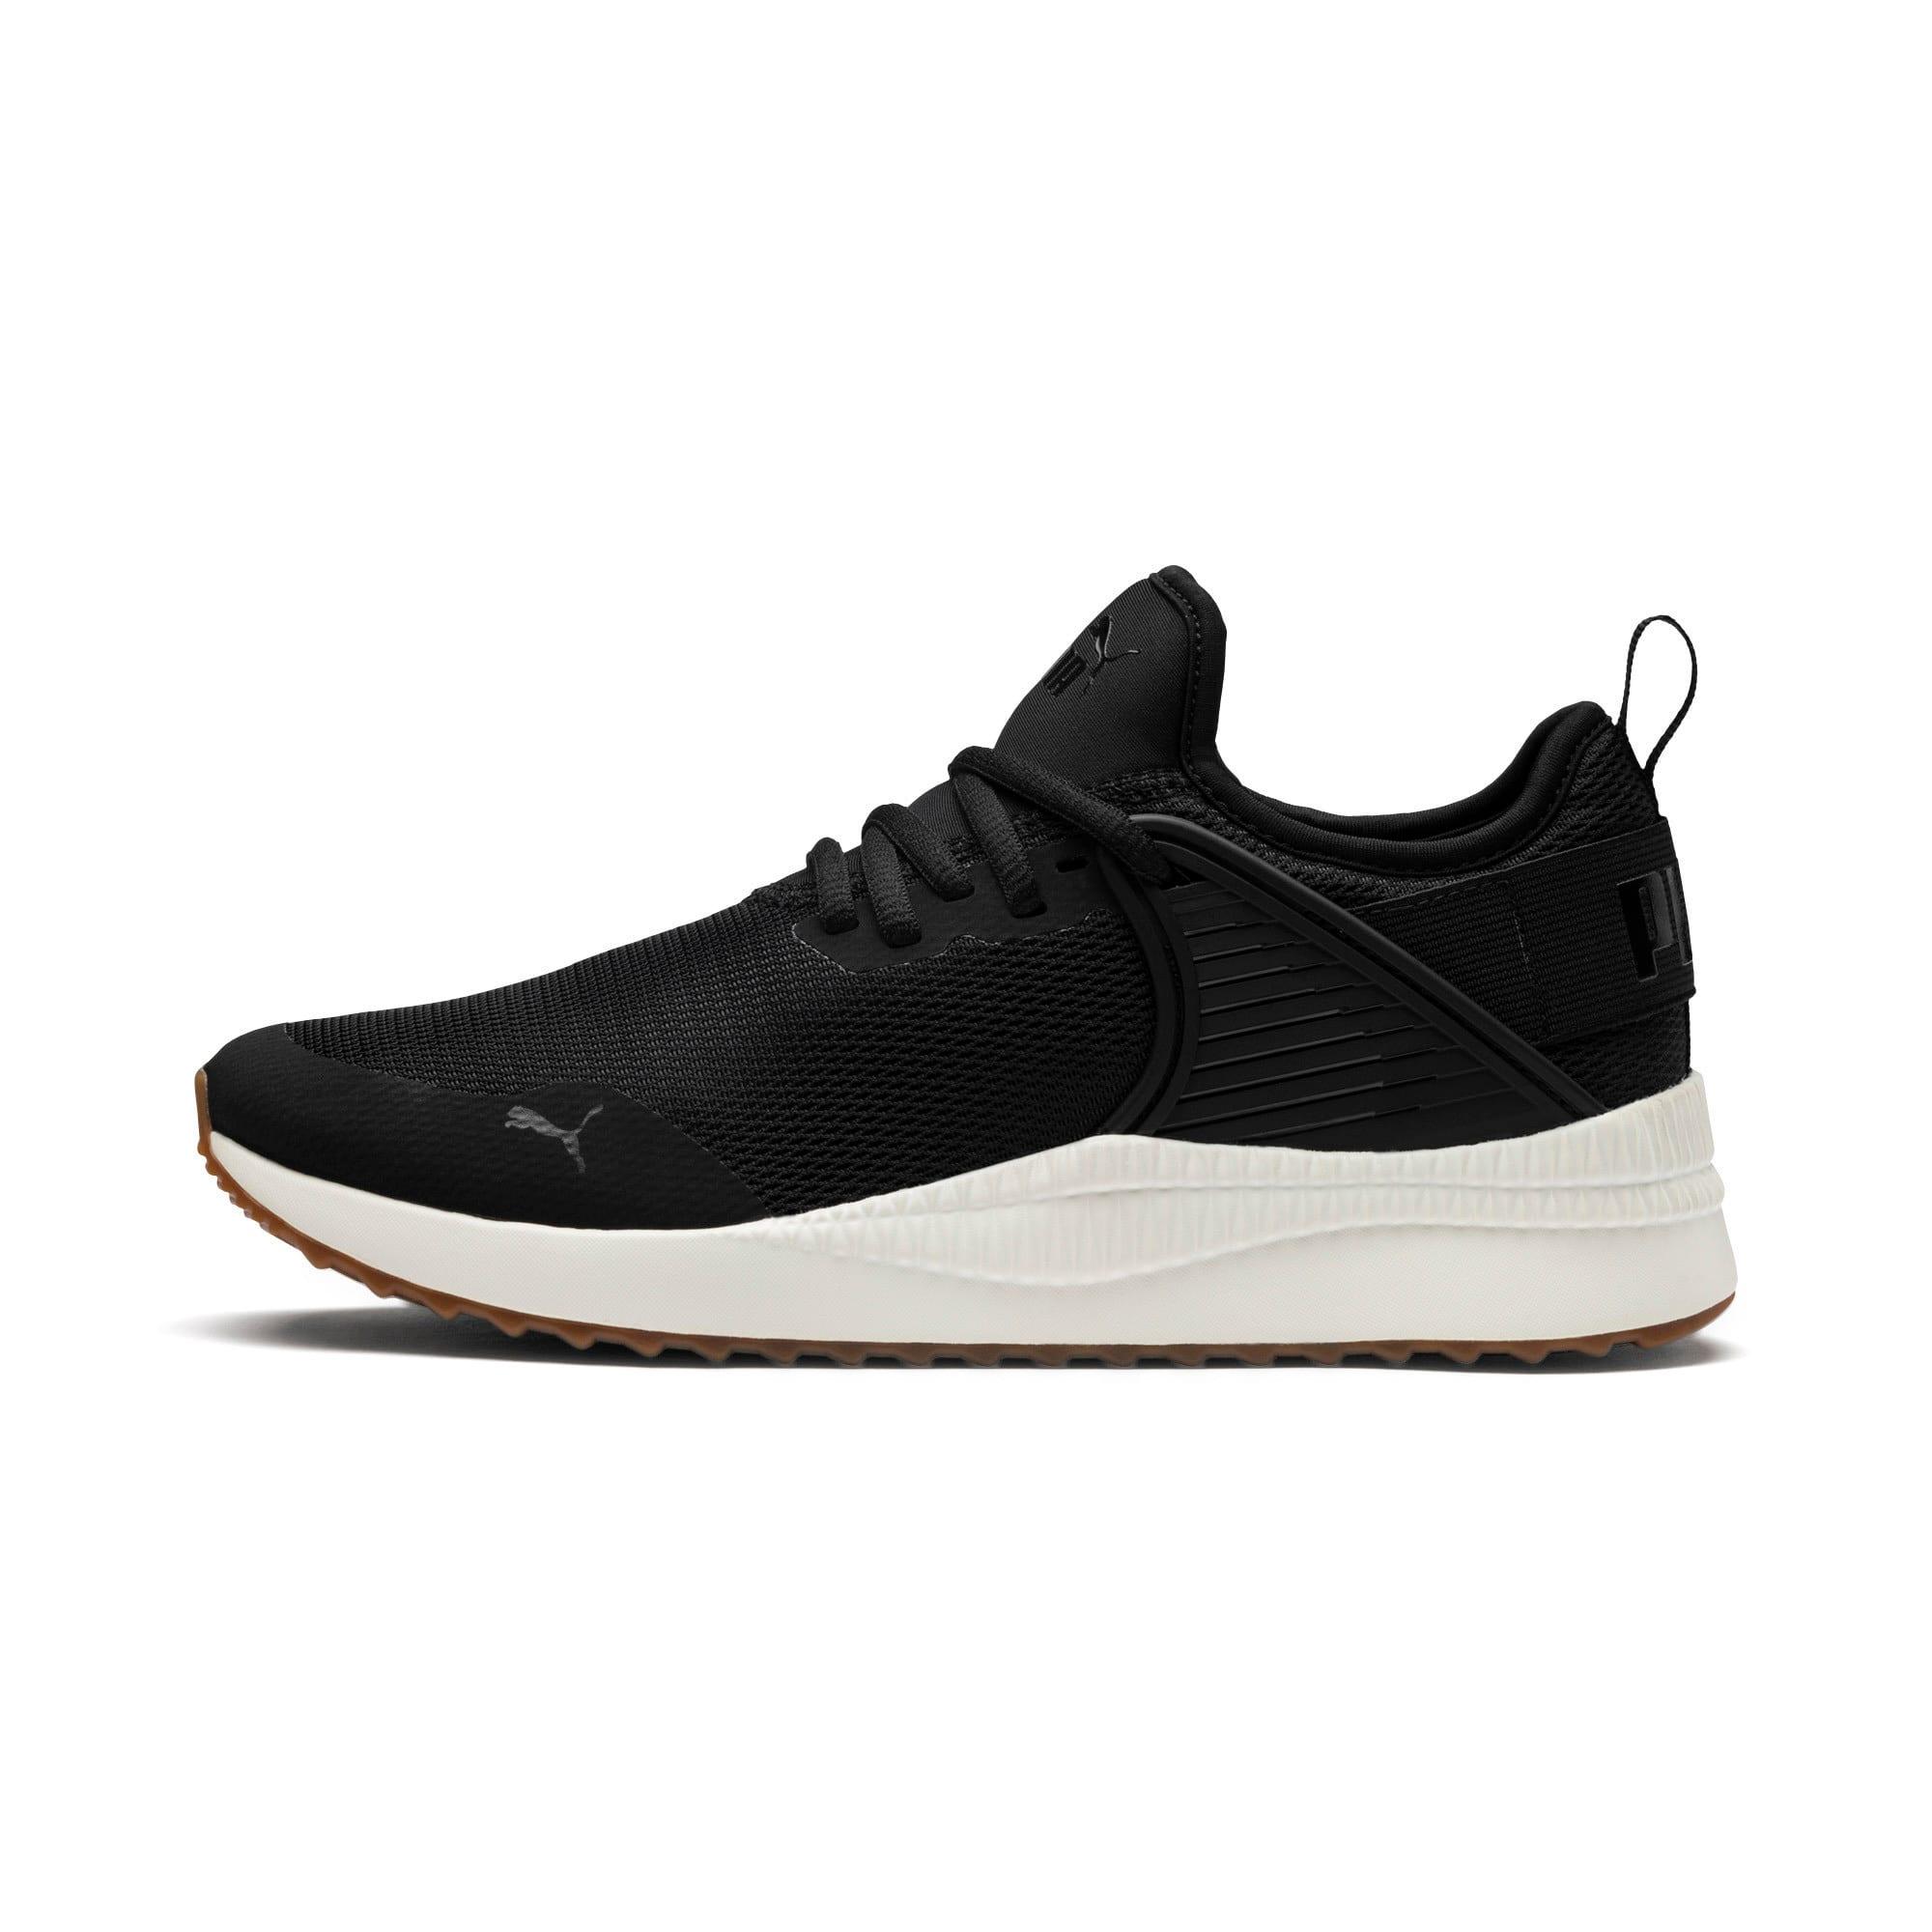 Thumbnail 1 of Pacer Next Cage Sneakers, P. Black-P. Black-Whis.White, medium